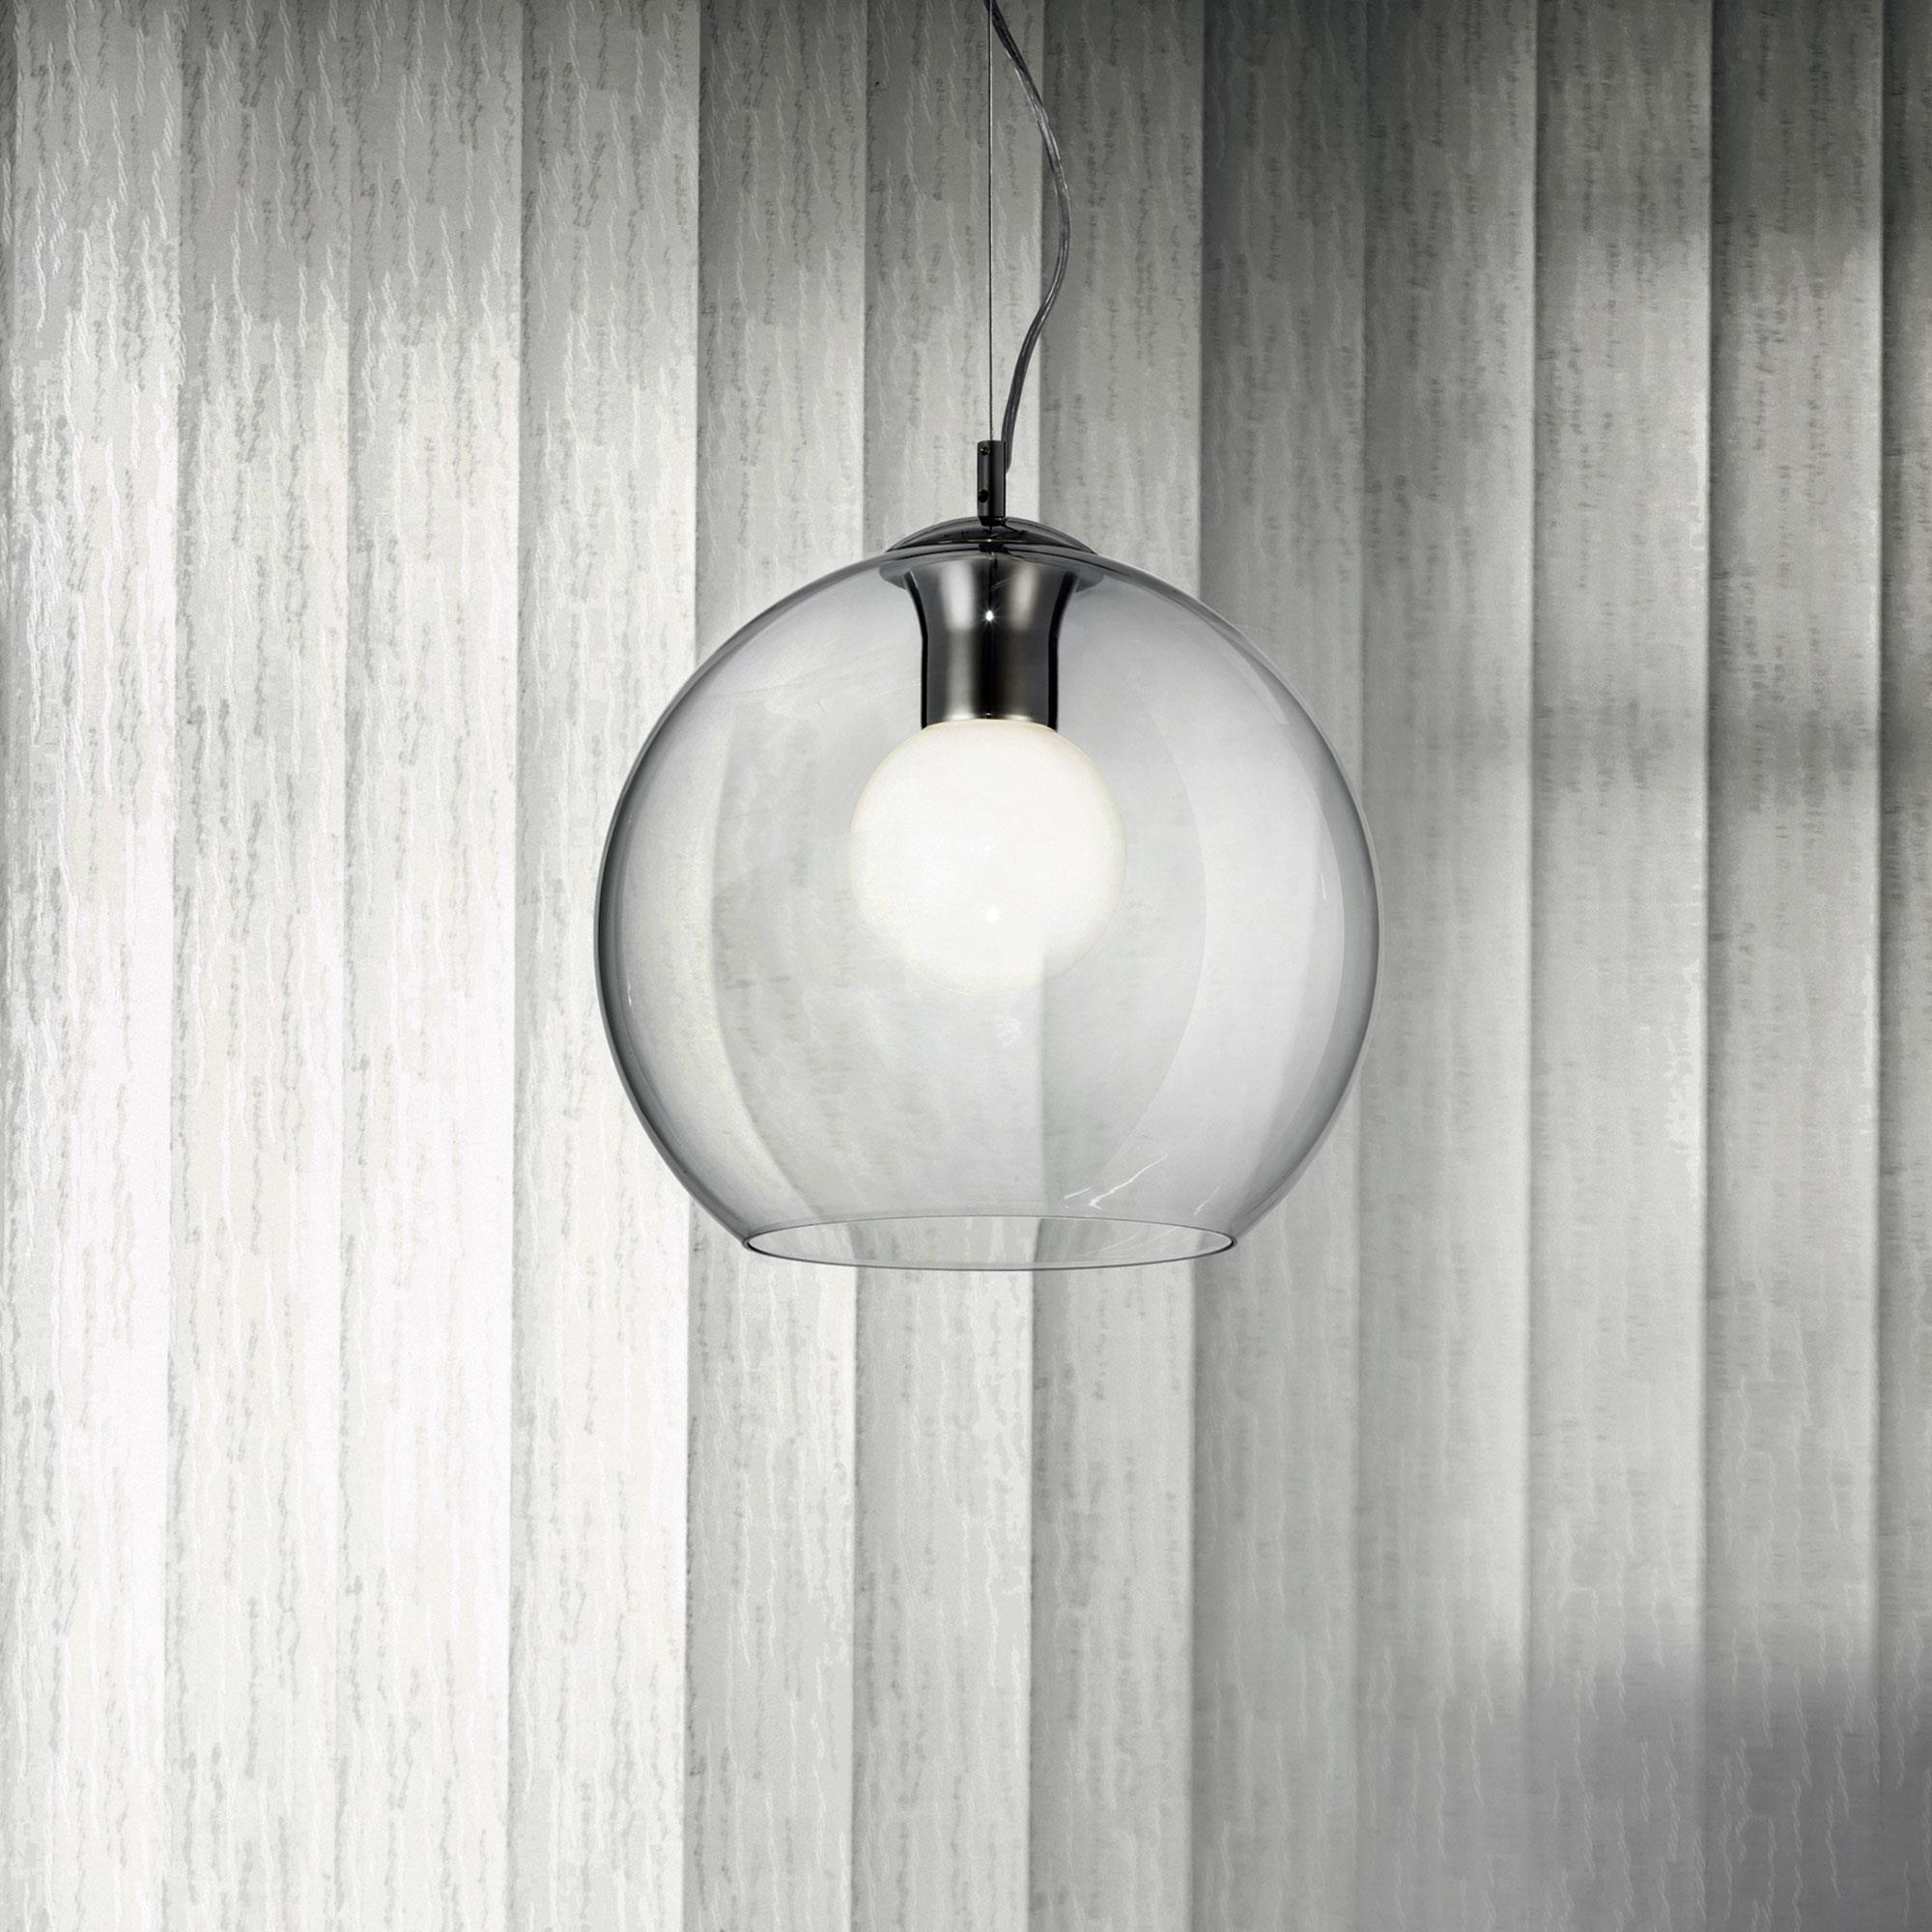 Ideal Lux 052809 Nemo SP1 D30 Clear lámpa függeszték